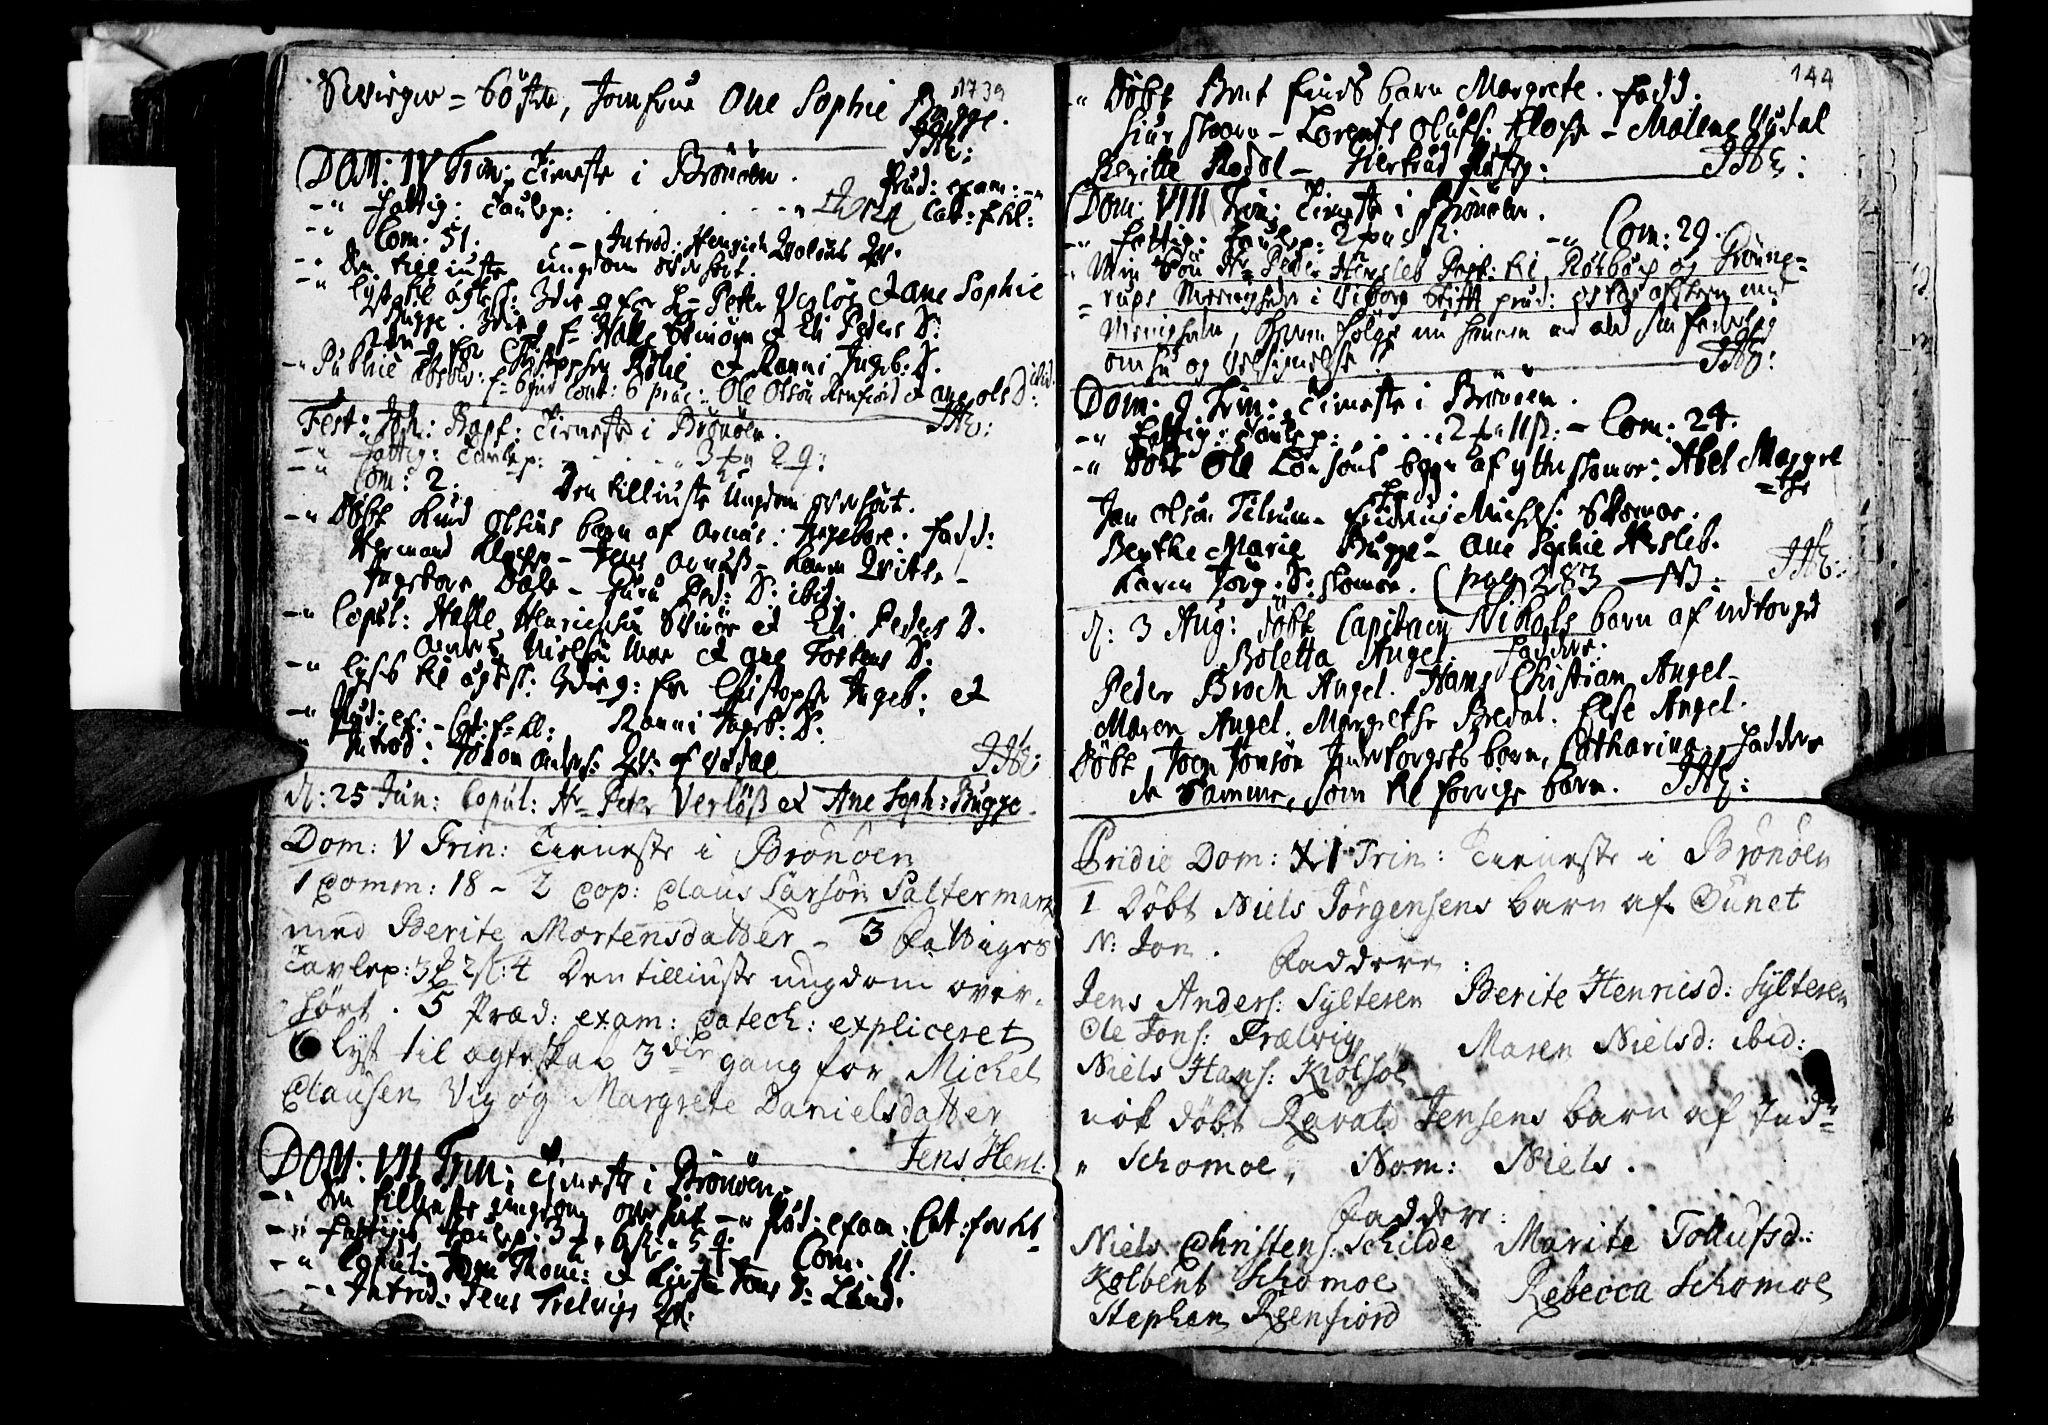 SAT, Ministerialprotokoller, klokkerbøker og fødselsregistre - Nordland, 813/L0194: Ministerialbok nr. 813A04, 1719-1758, s. 144